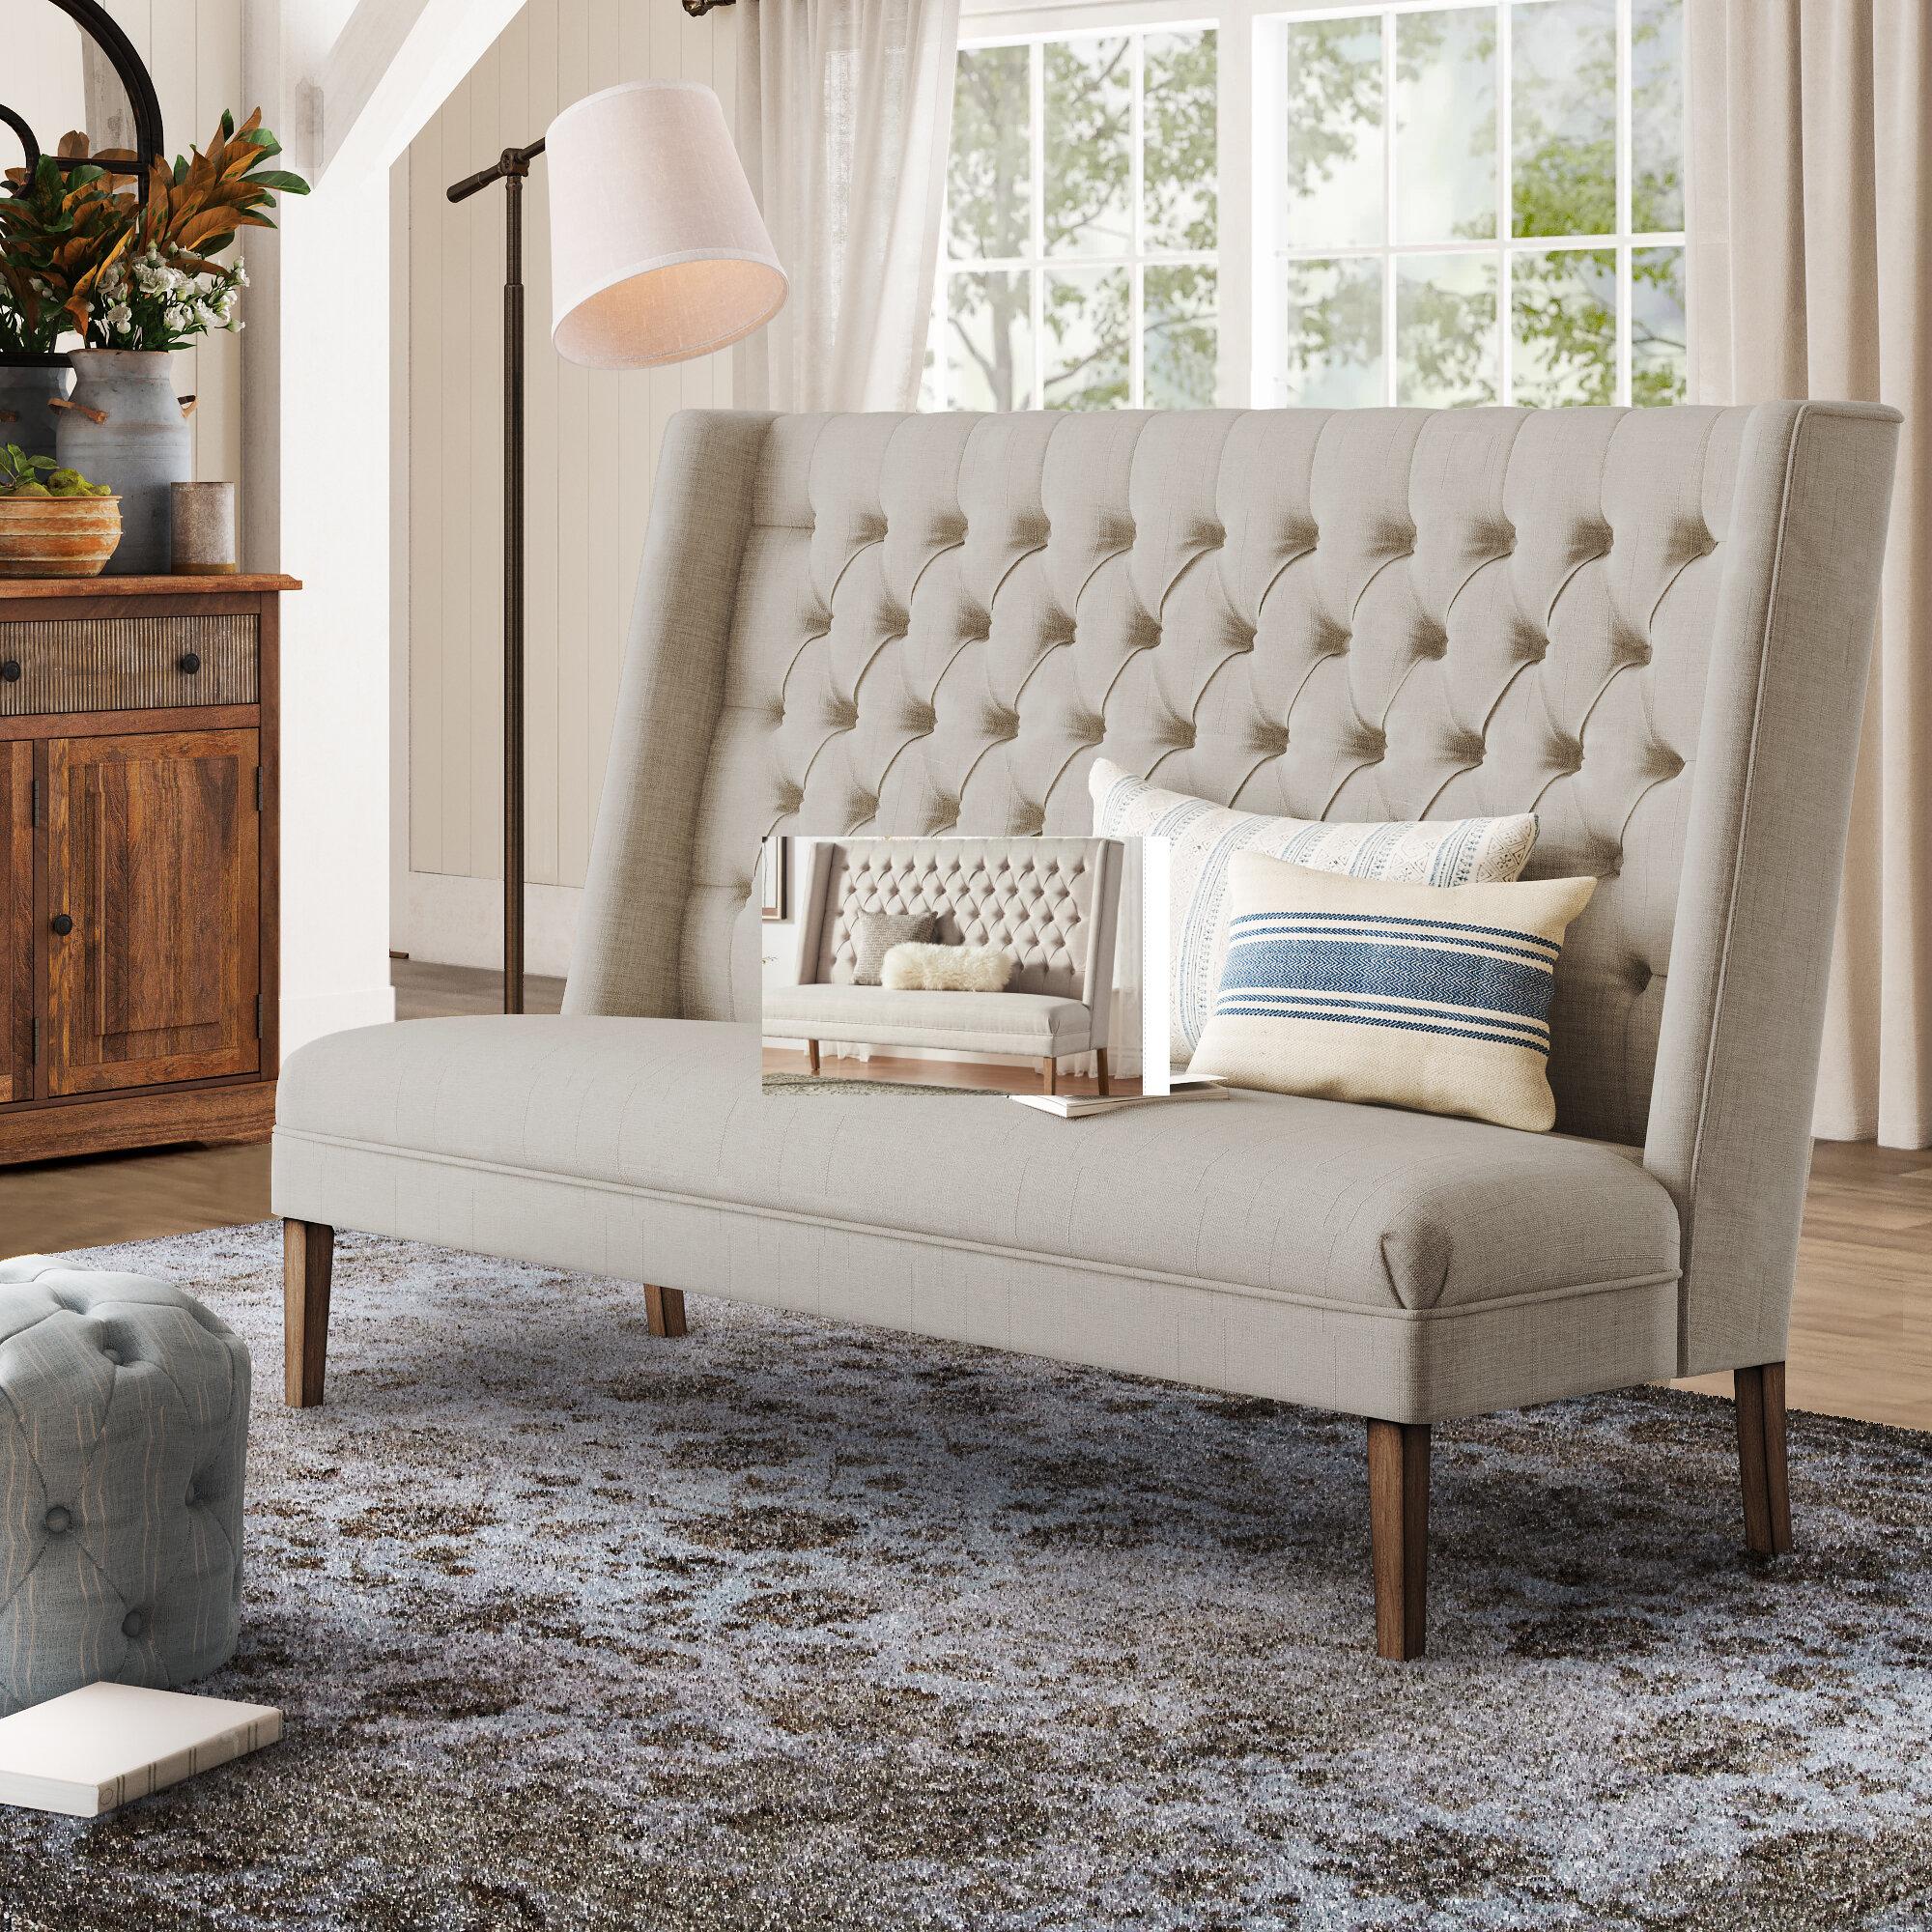 Picture of: Splendora Tufted Upholstered Bedroom Bench Reviews Birch Lane